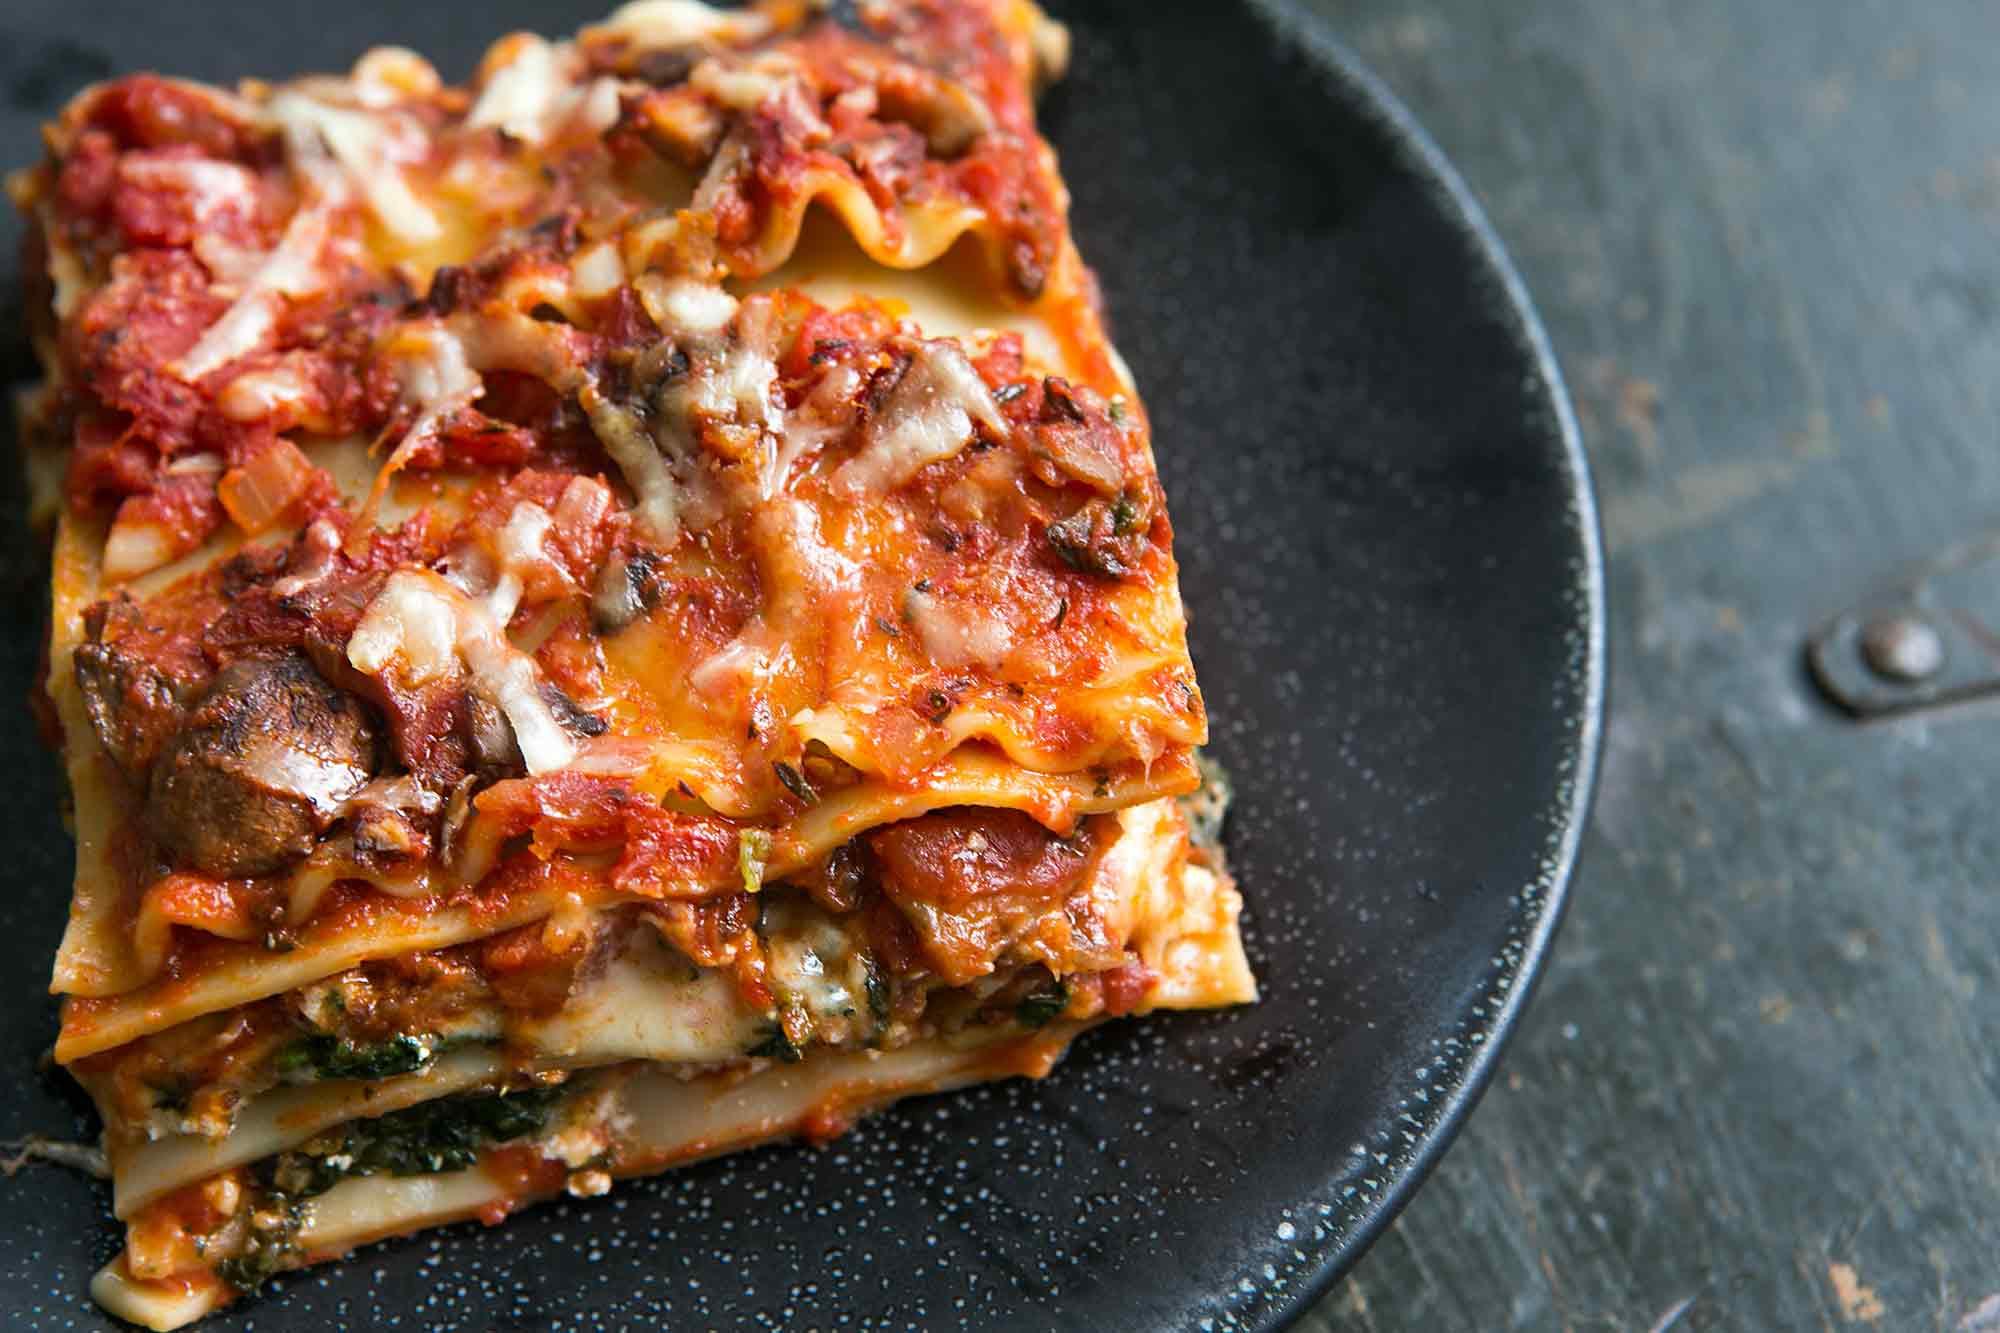 Vegetarian Lasagna With Tofu  Ve able Lasagna A Favorite for All